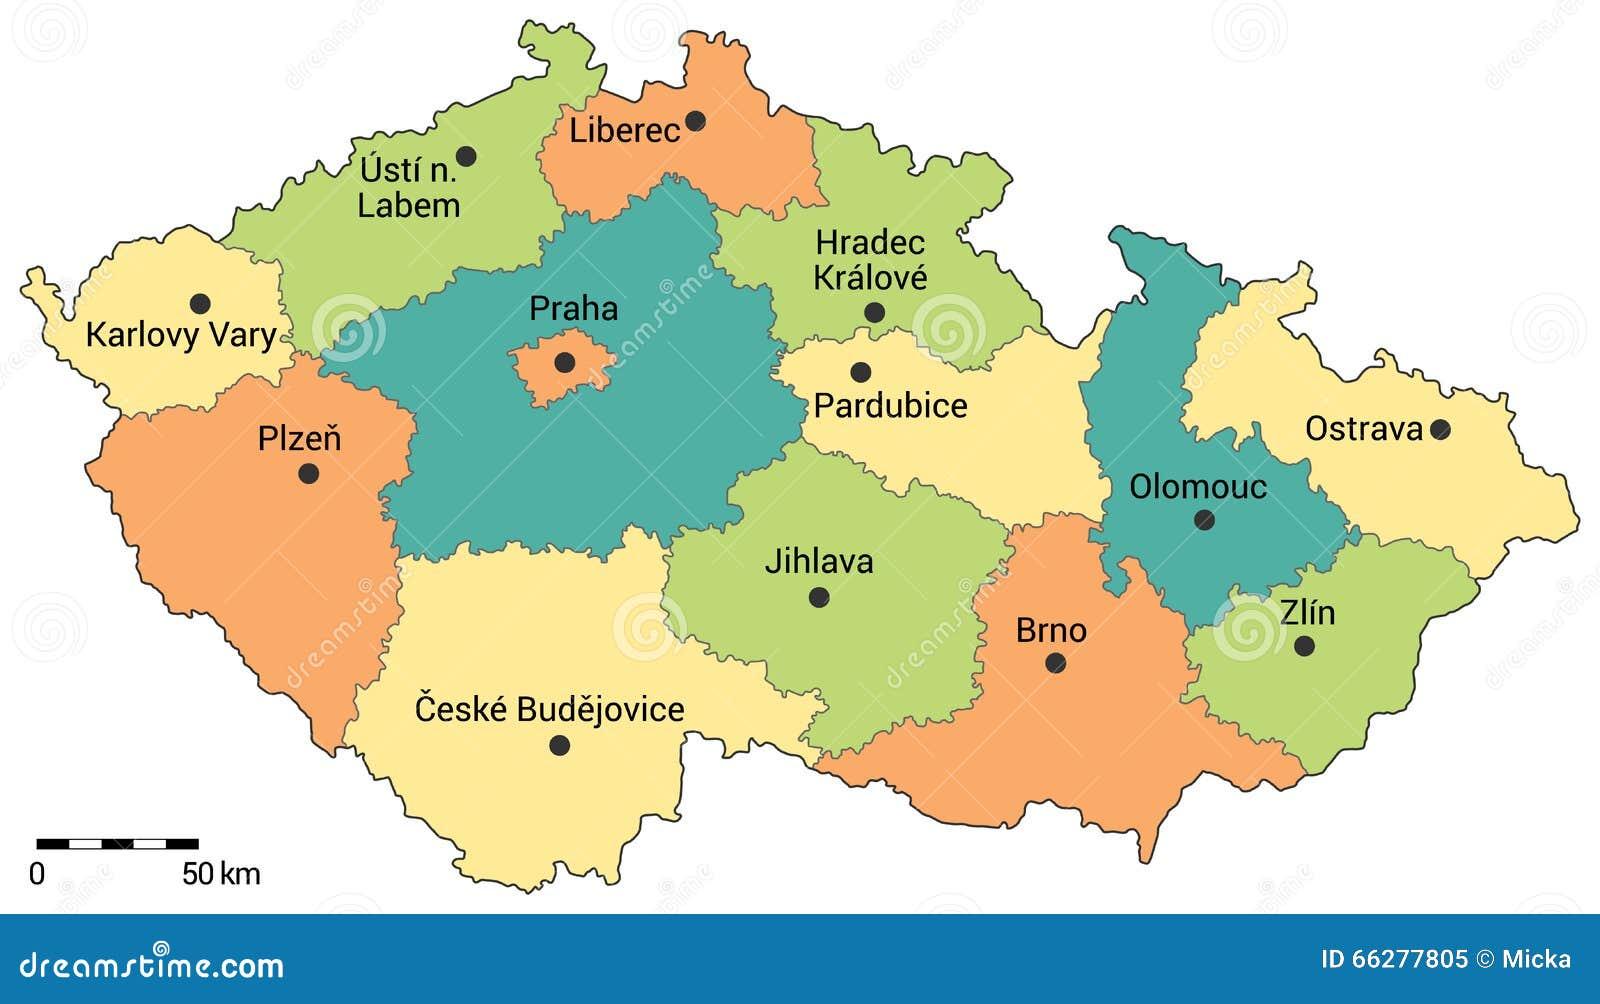 Politics of the Czech Republic